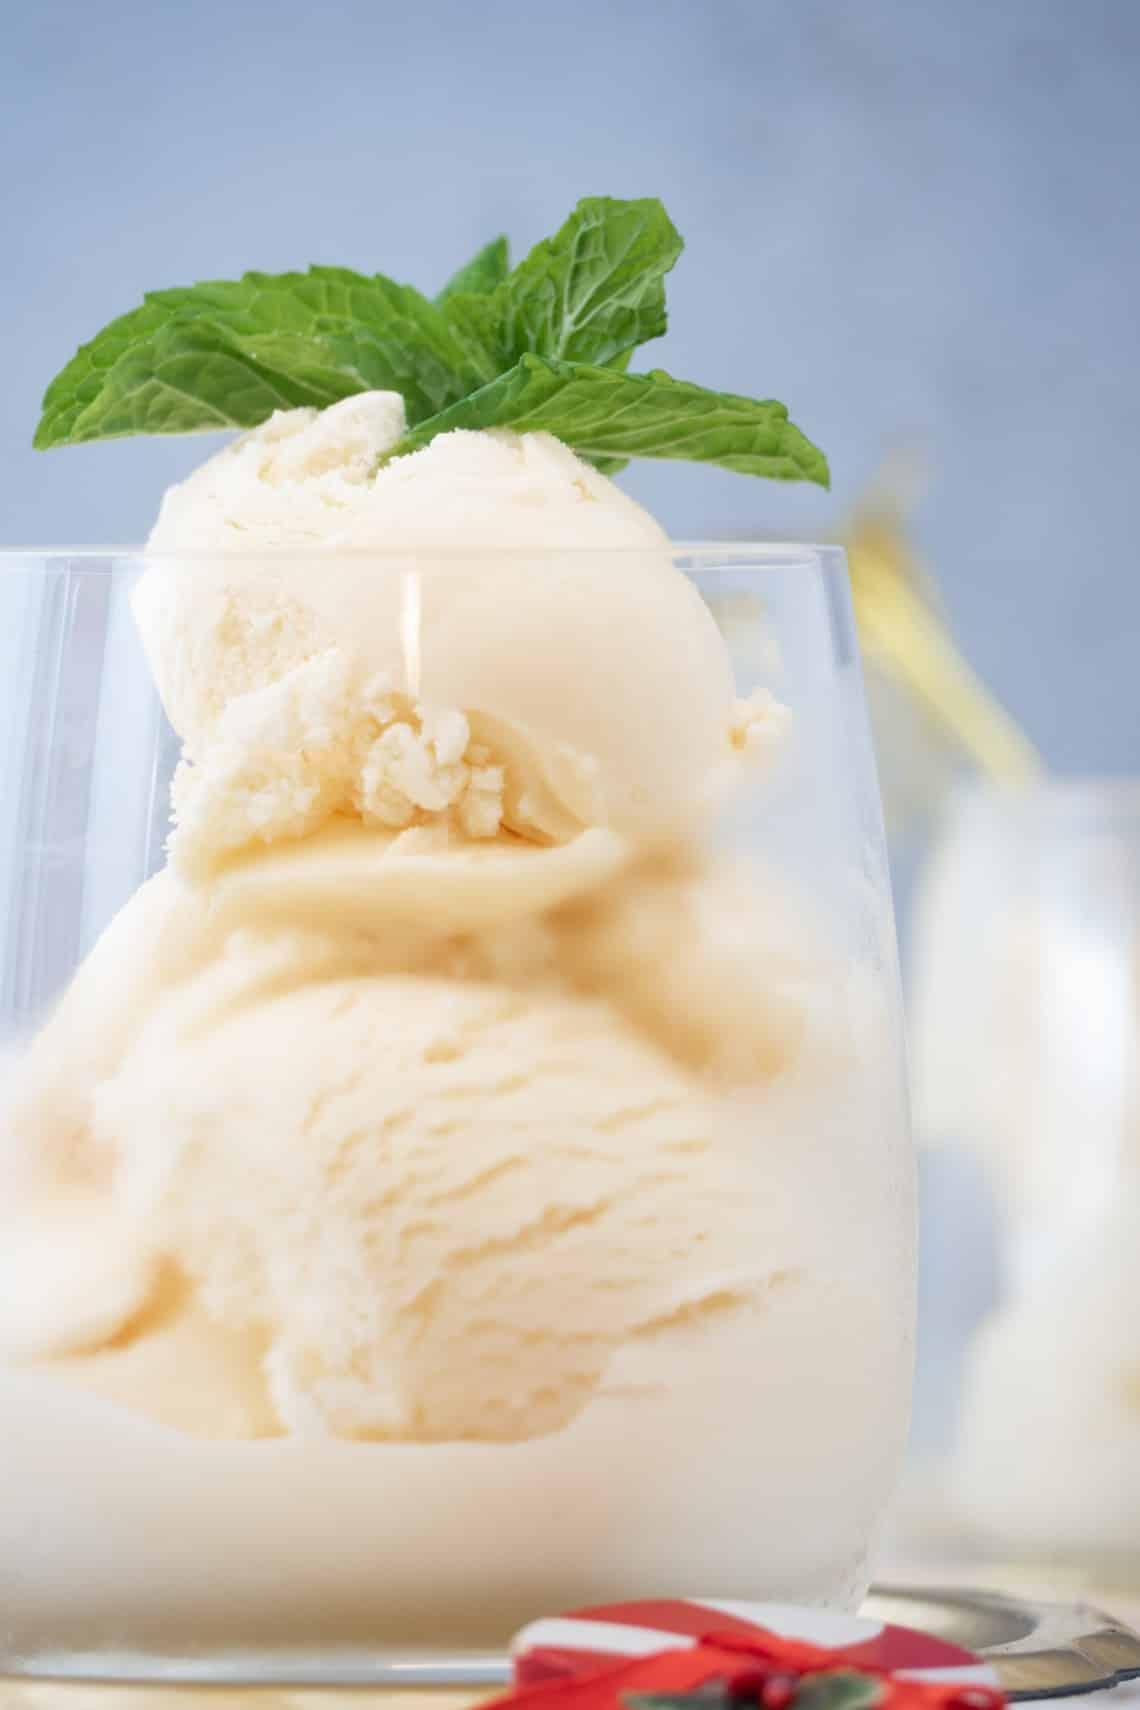 Keto Candy Cane Ice Cream